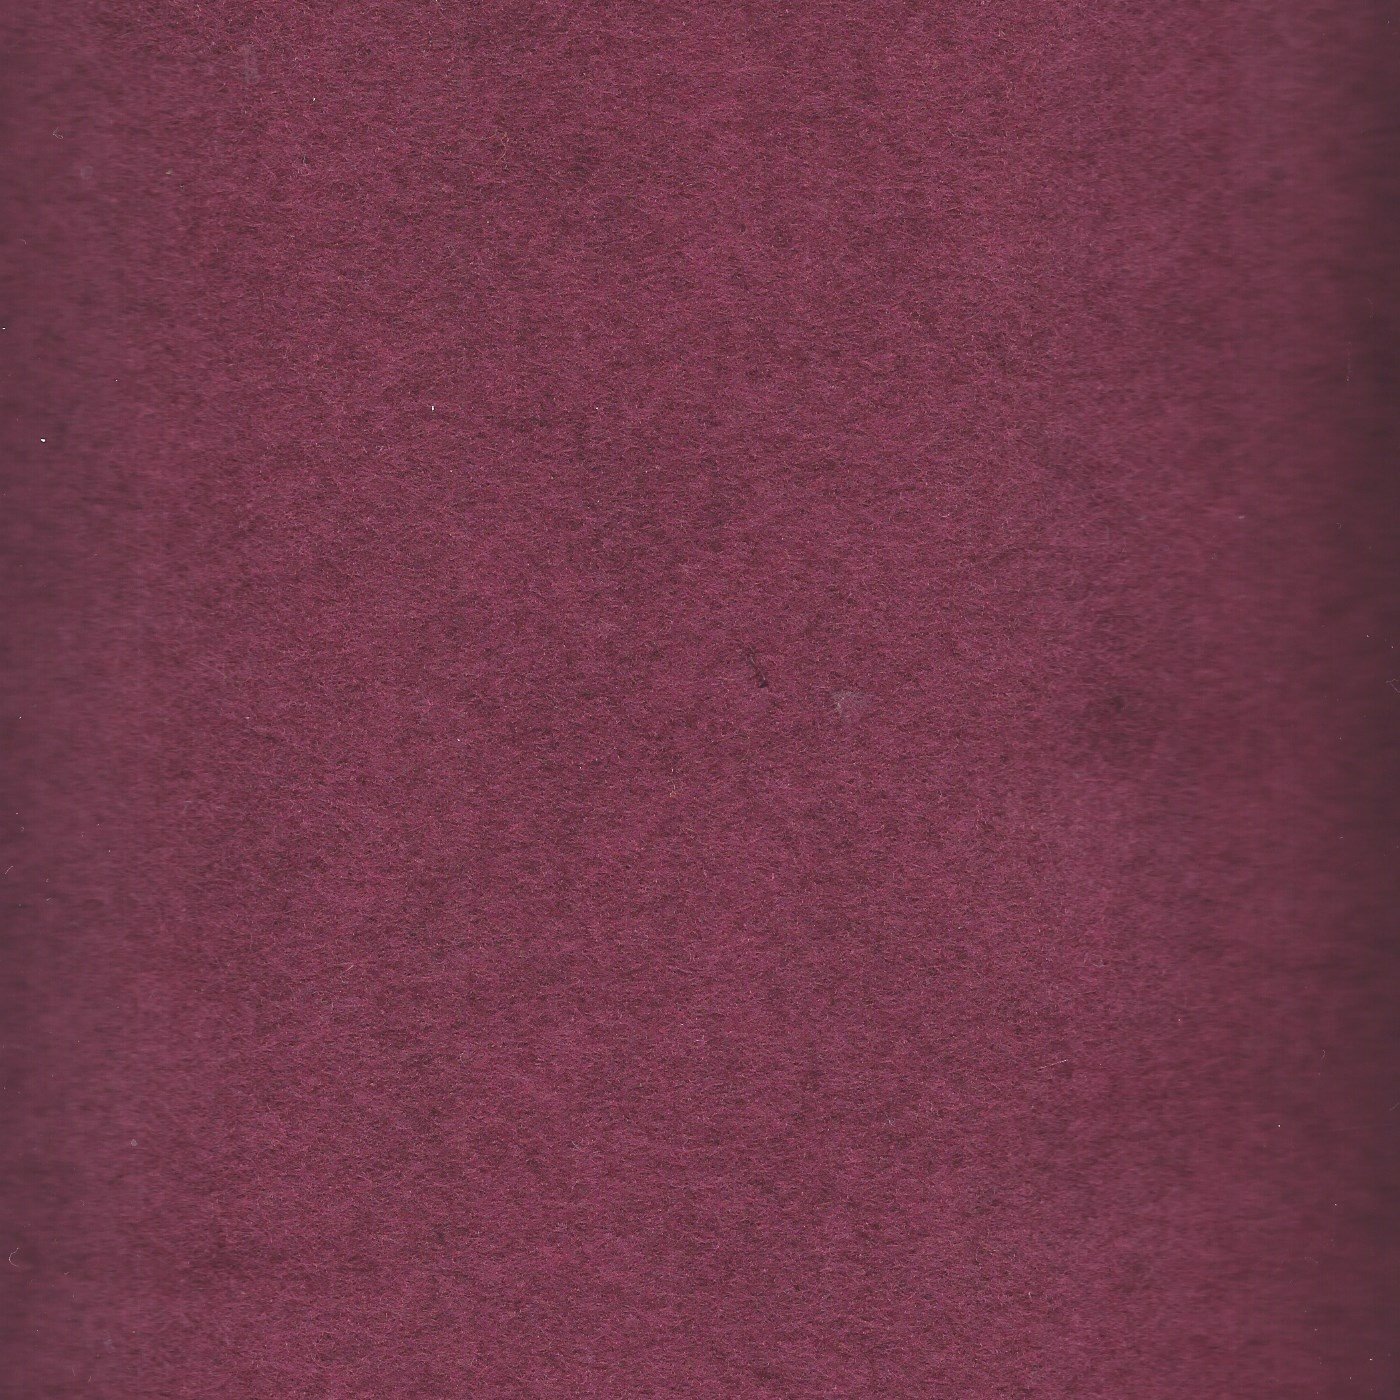 TOY002-2210 Woolfelt 36 Wide Victorian Rose 25% Wool 65% Rayon